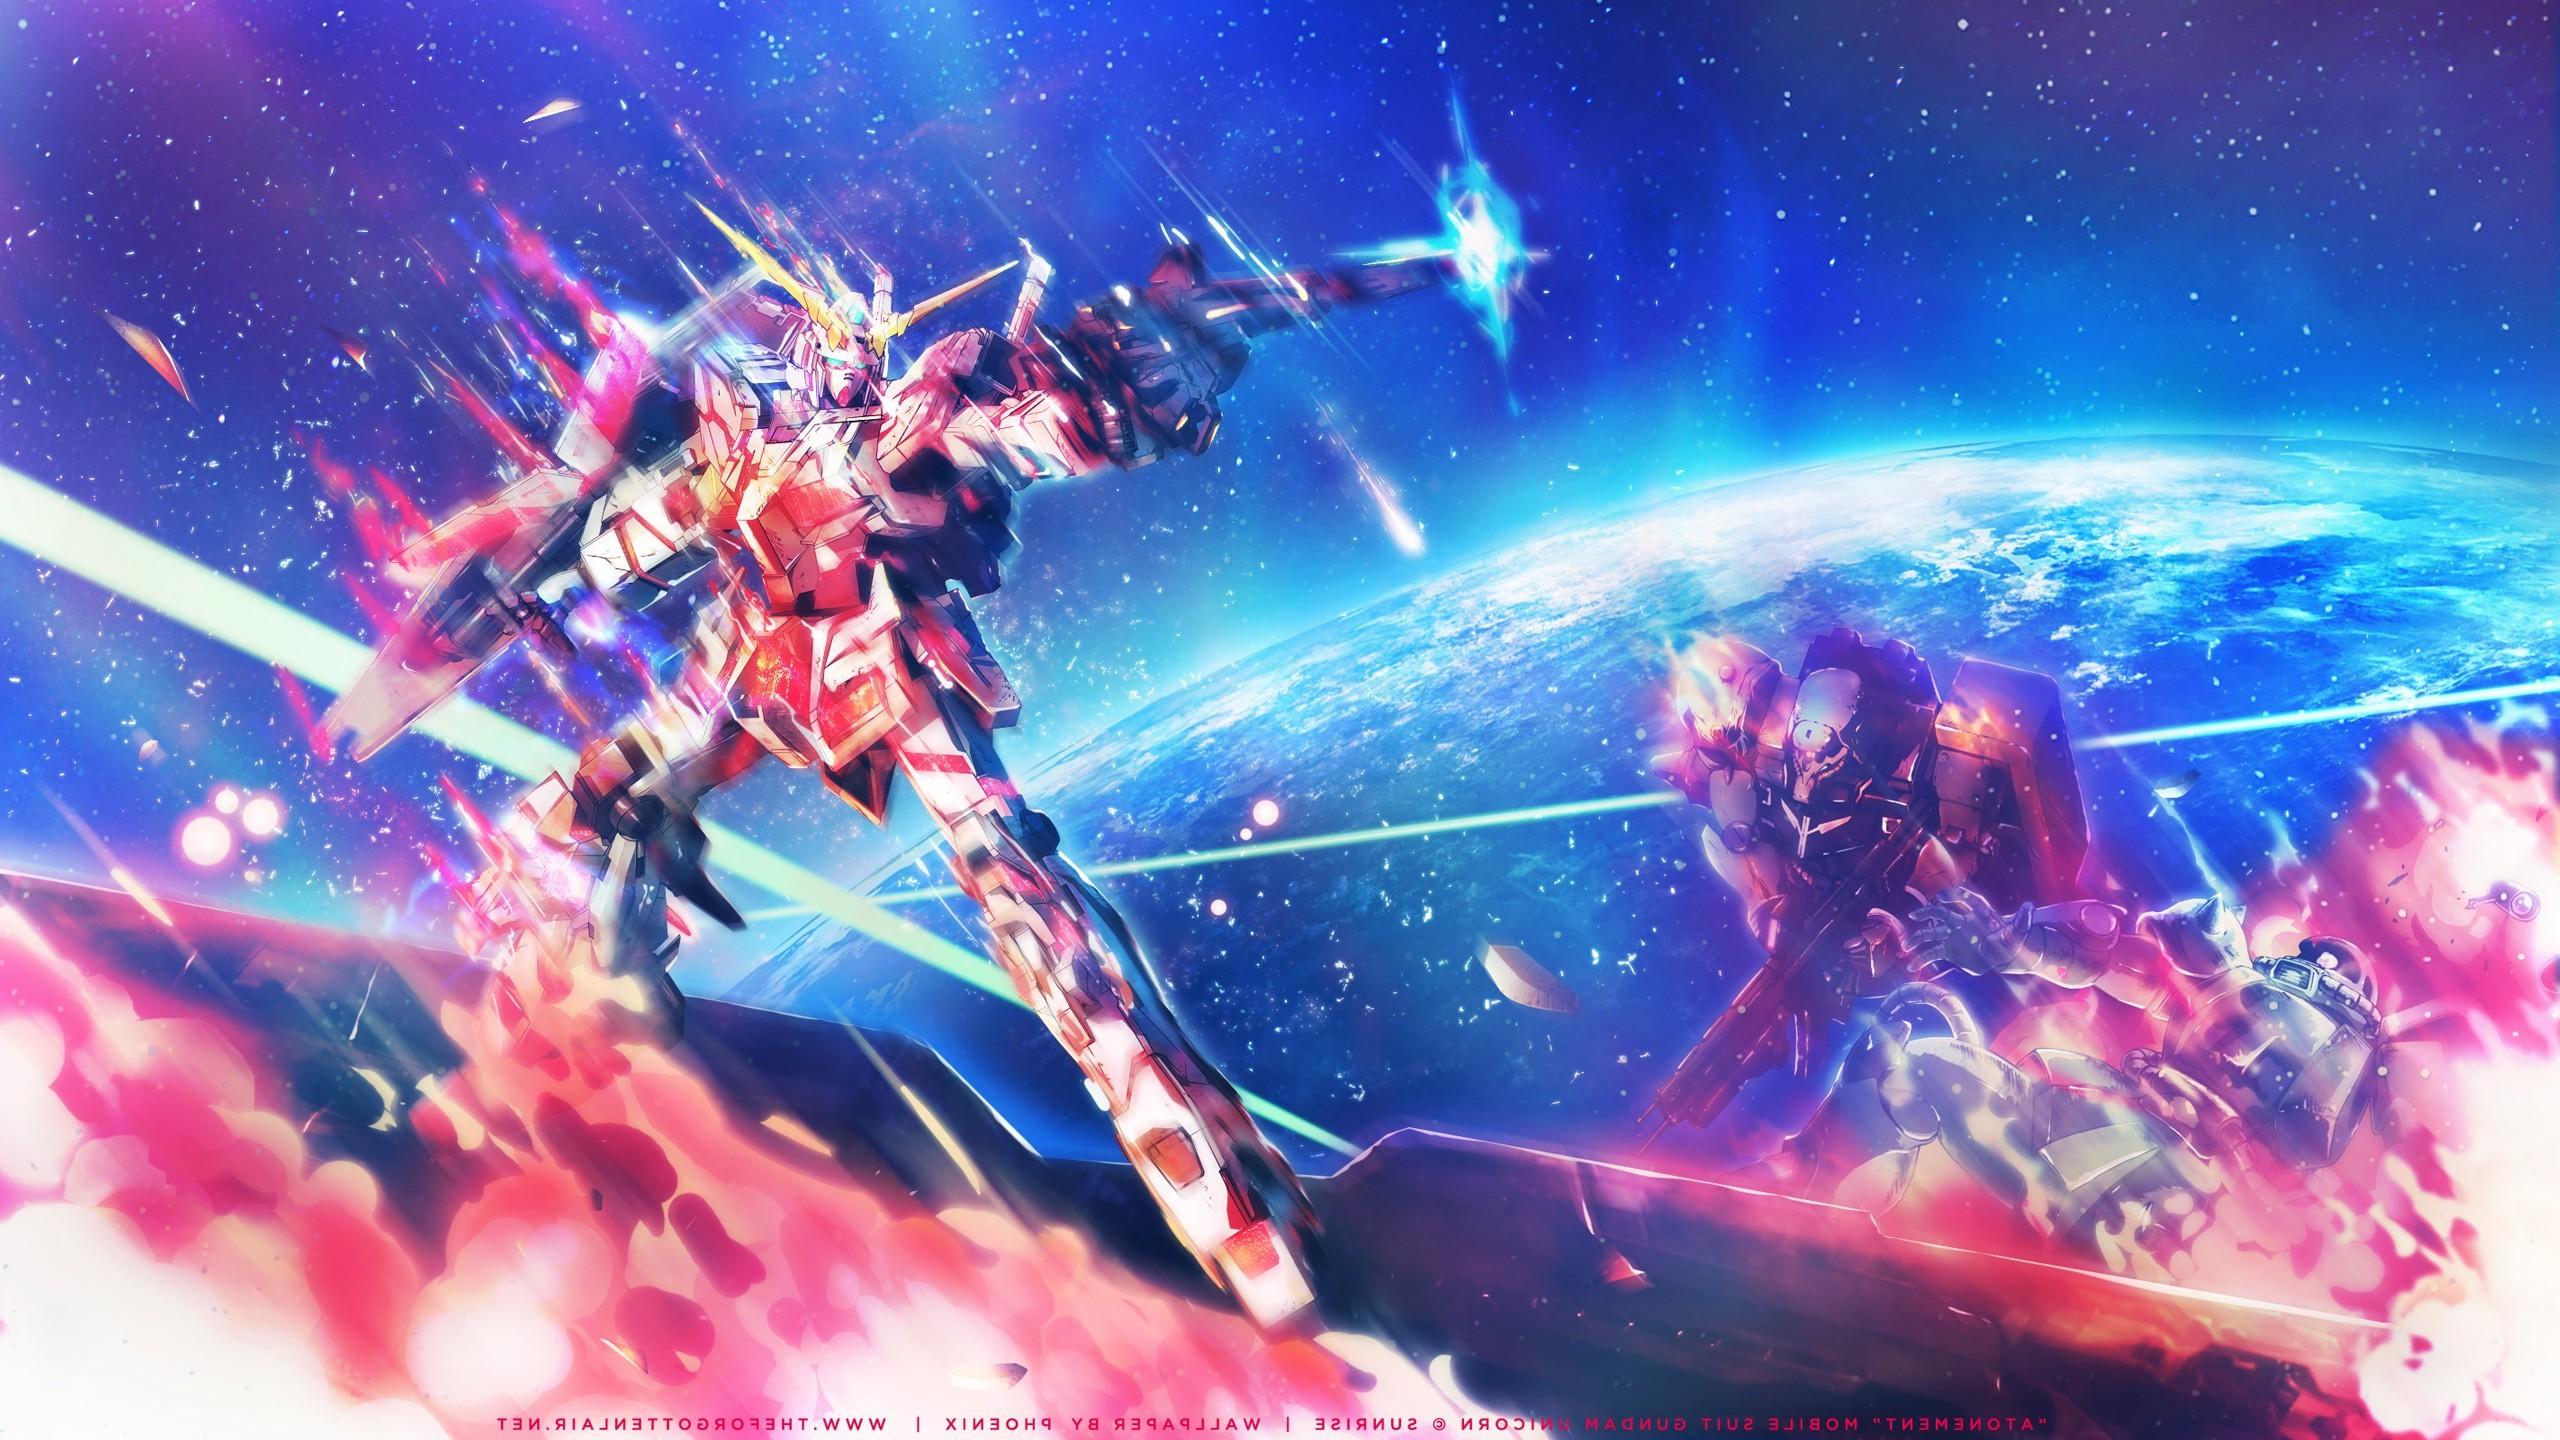 Wallpaper 2560x1440 Px Mech Mobile Suit Gundam Mobile Suit Gundam Unicorn 2560x1440 Wallhaven 1028858 Hd Wallpapers Wallhere